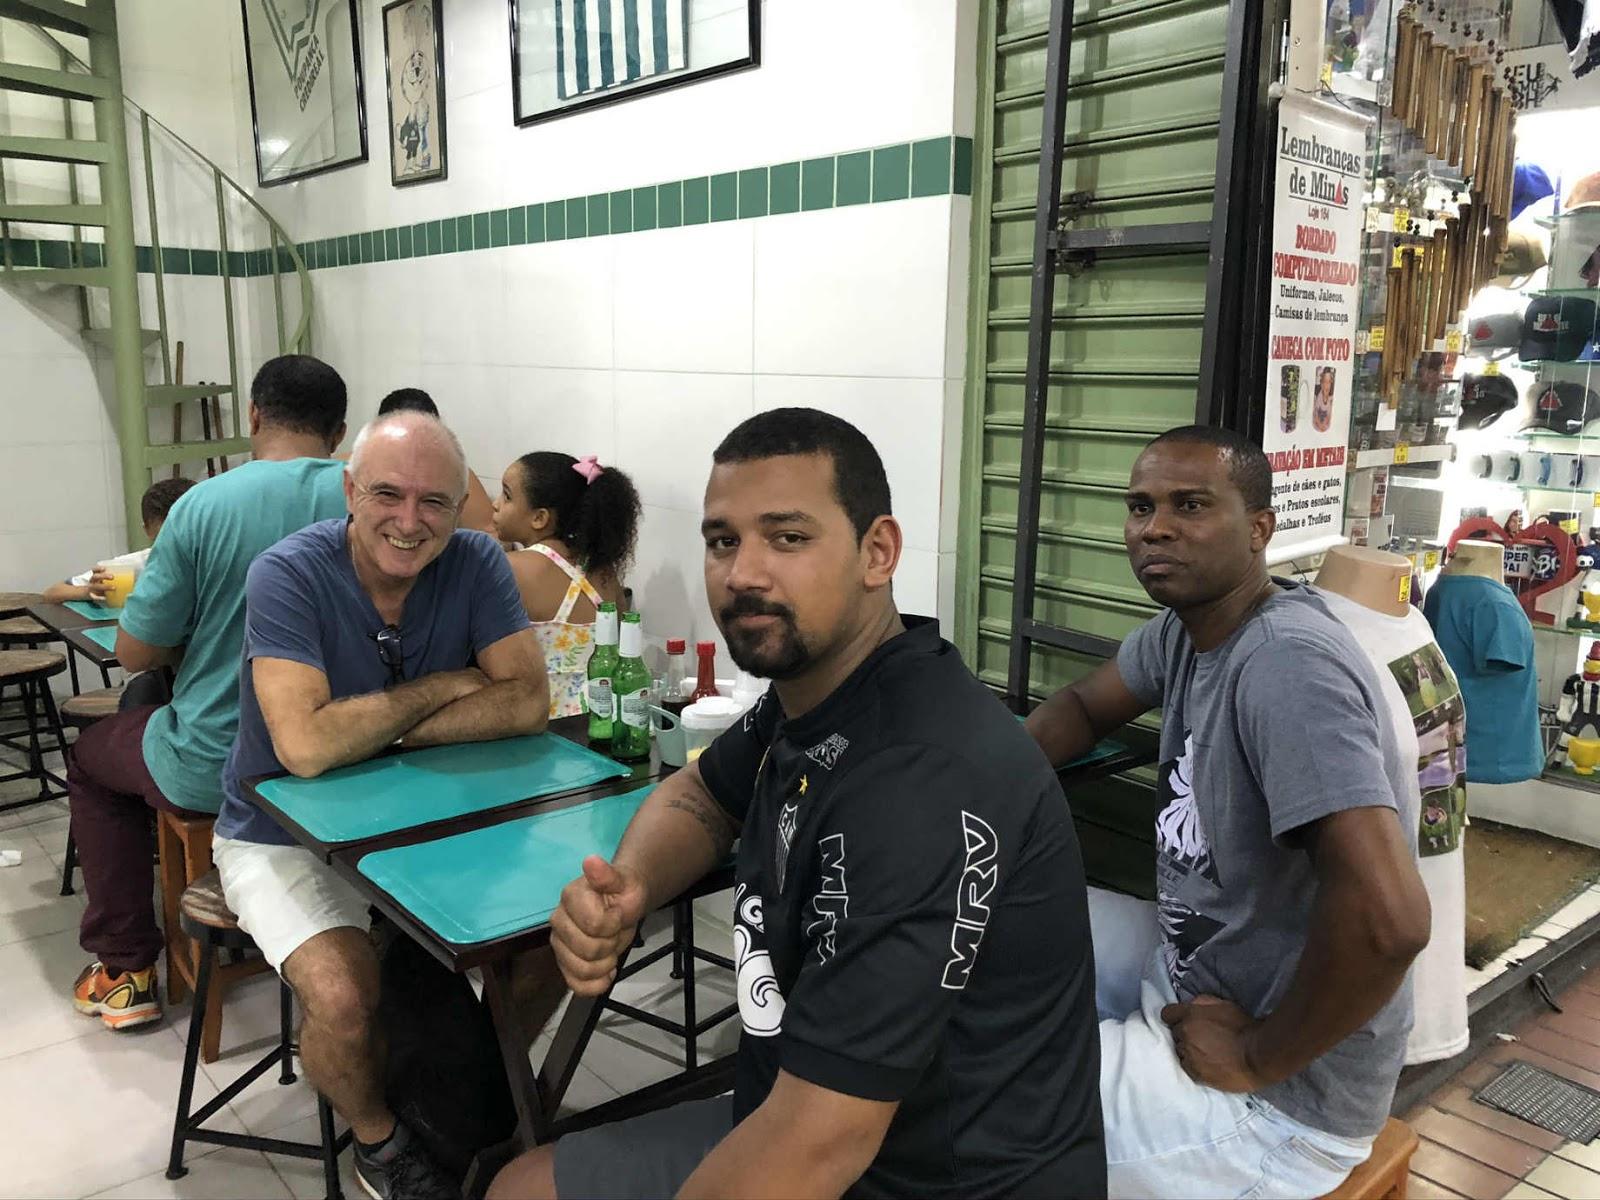 Restaurante Jorge Americano - Belo Horizonte